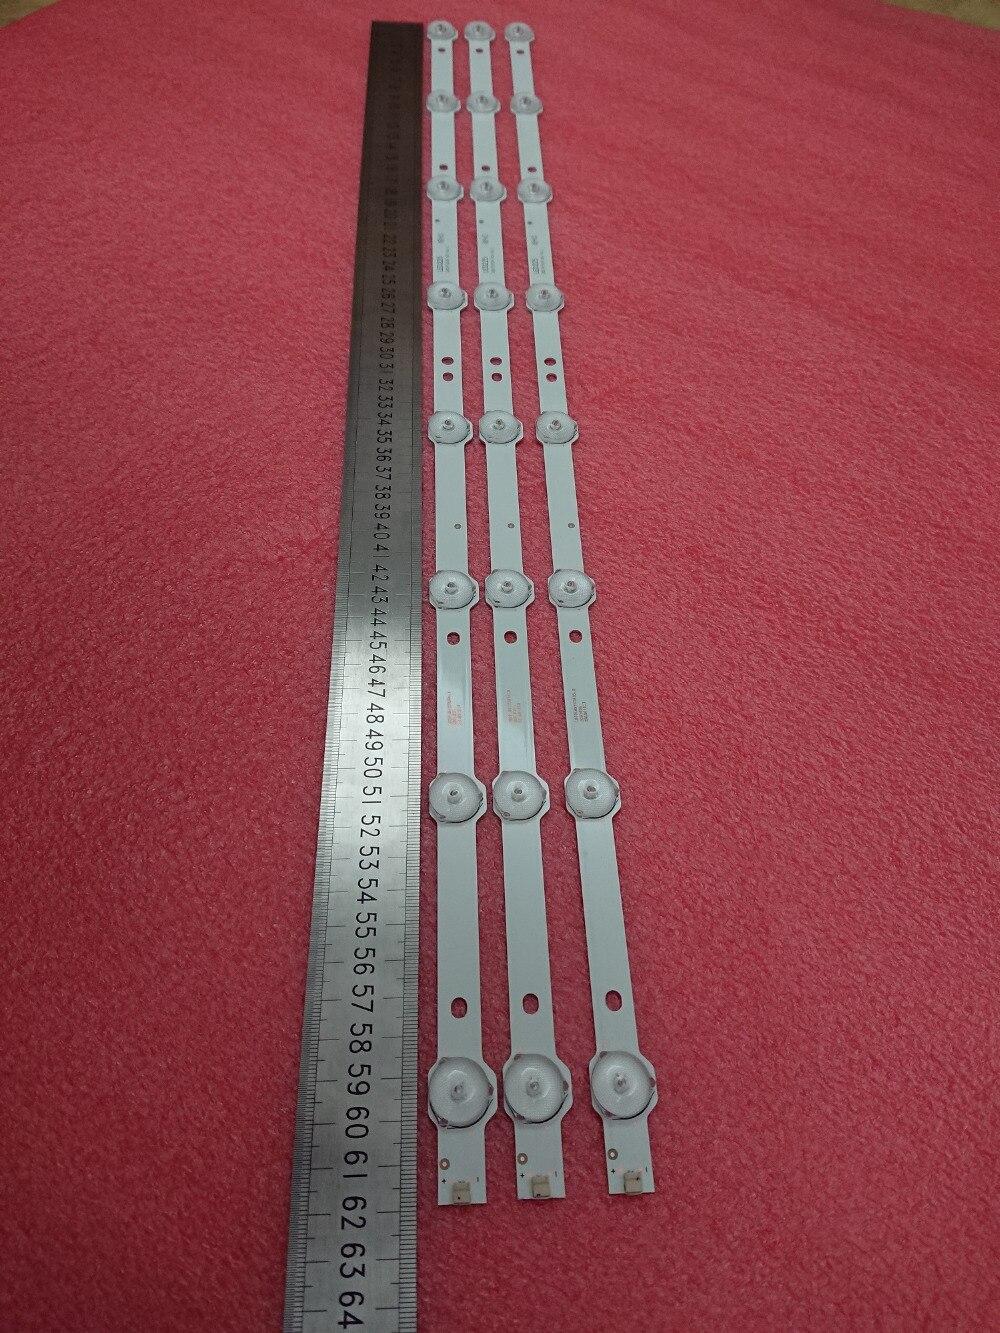 Novo conjunto 5 15 pcs 8LED = 618mm tira retroiluminação LED para LE32D59 32PFL3045 K320WD 4708-K320WD-A2213K01 A4213K01 471R1055 471R1P53